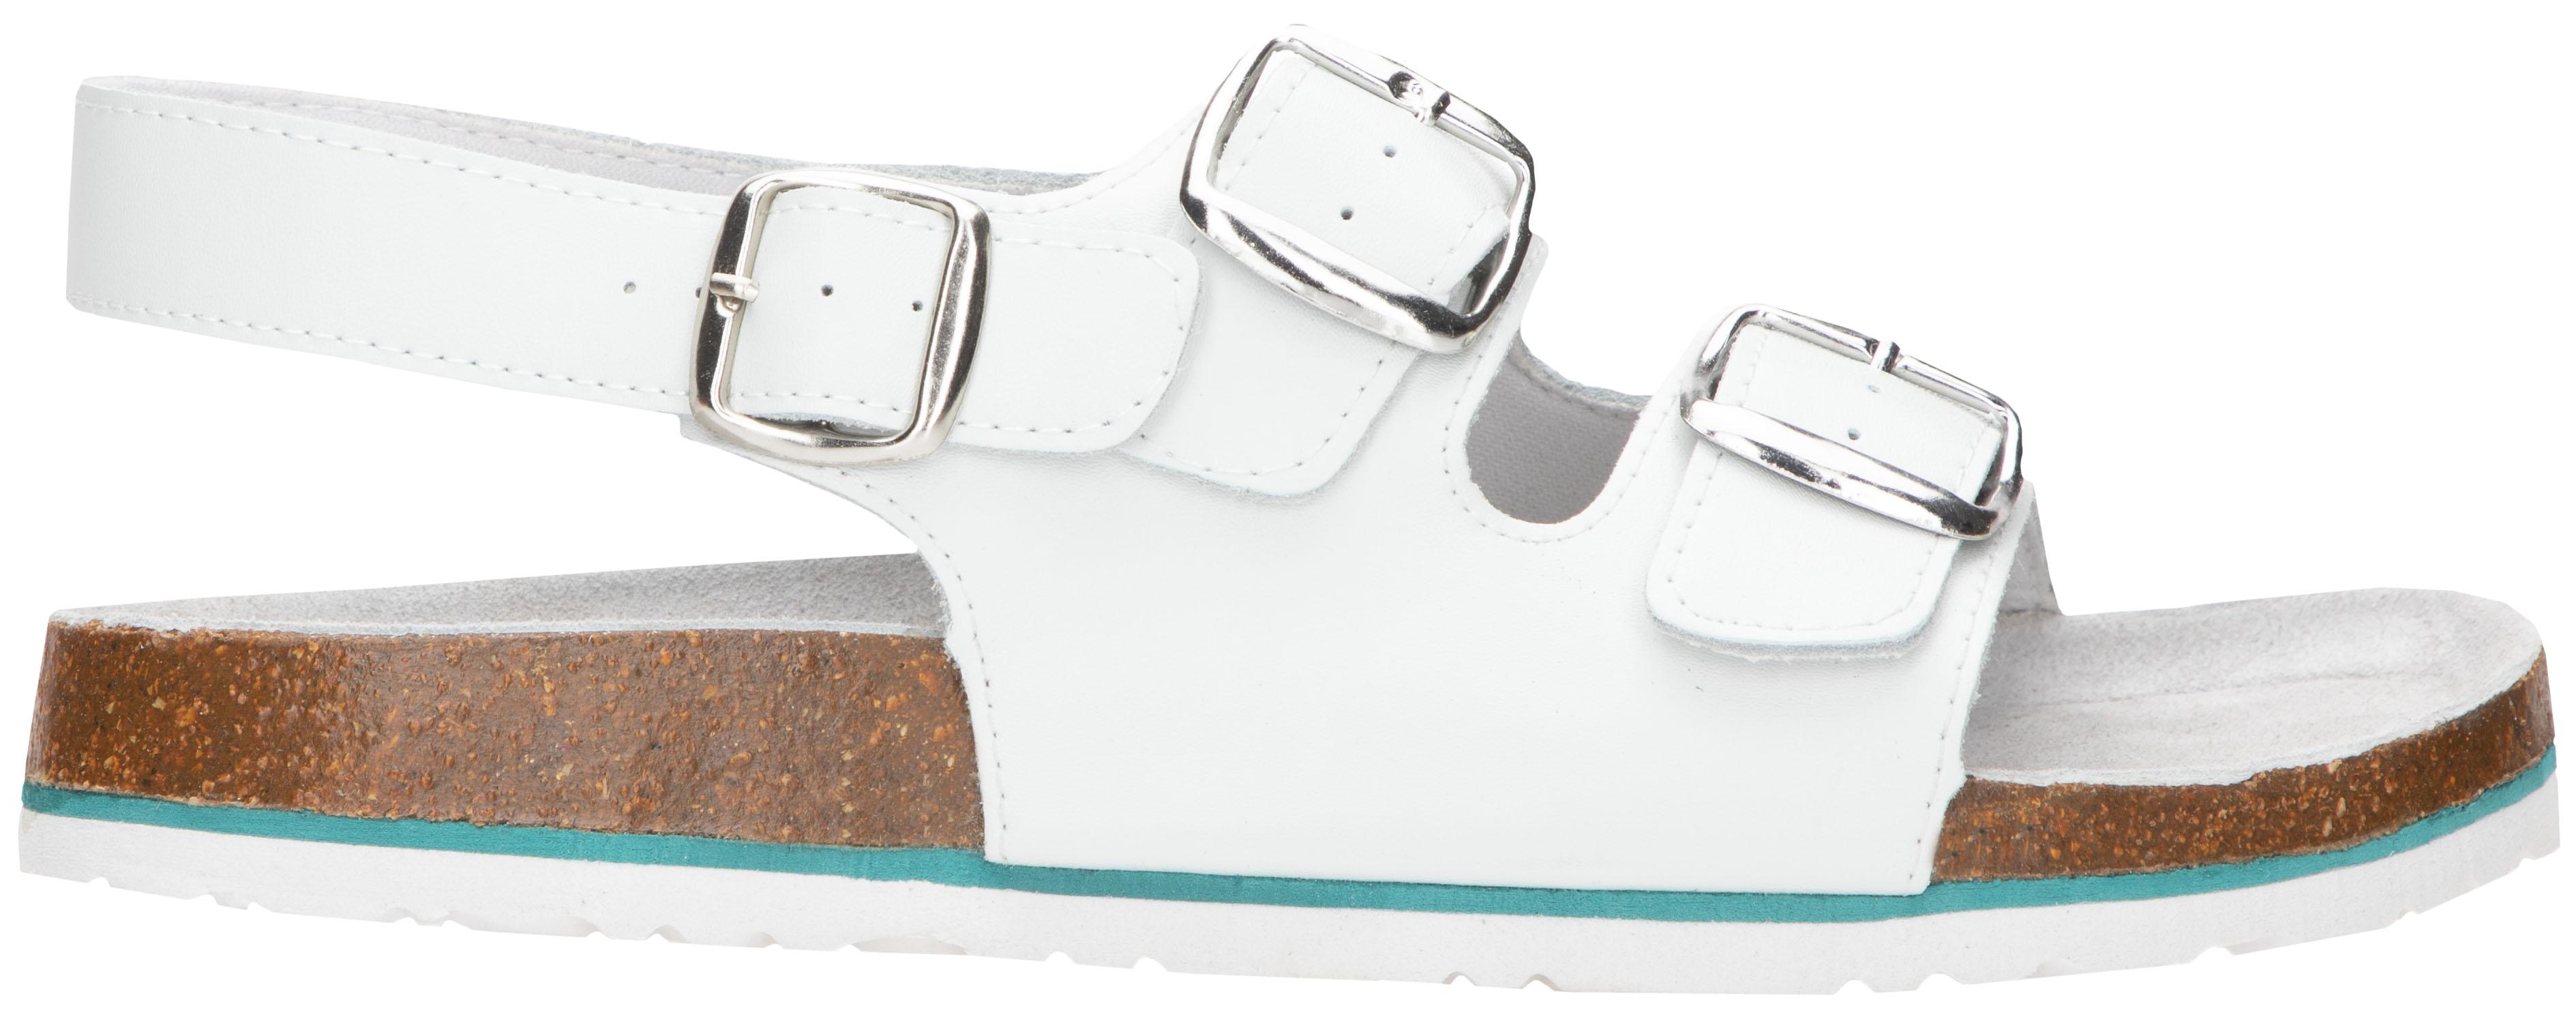 Sandál MERKUR bílý 36